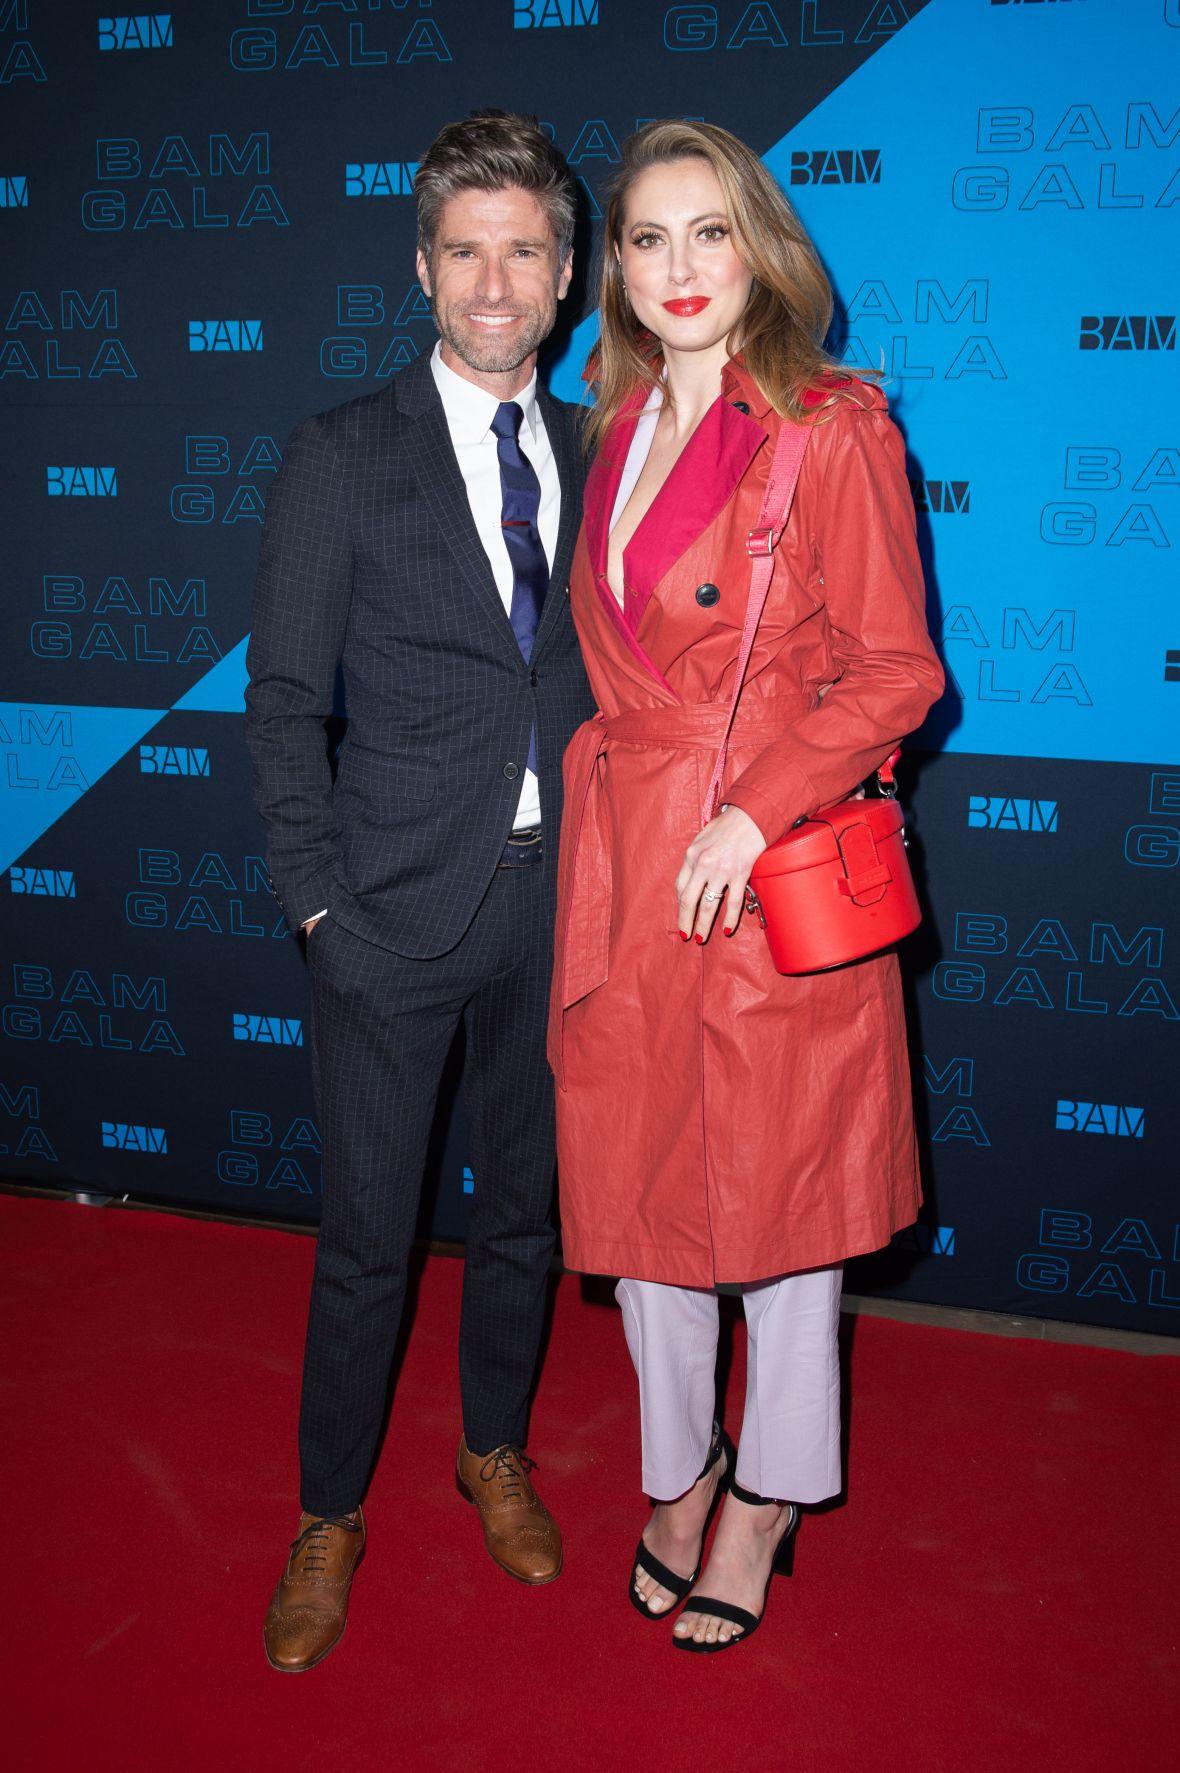 Kyle Martino and Eva Amurri